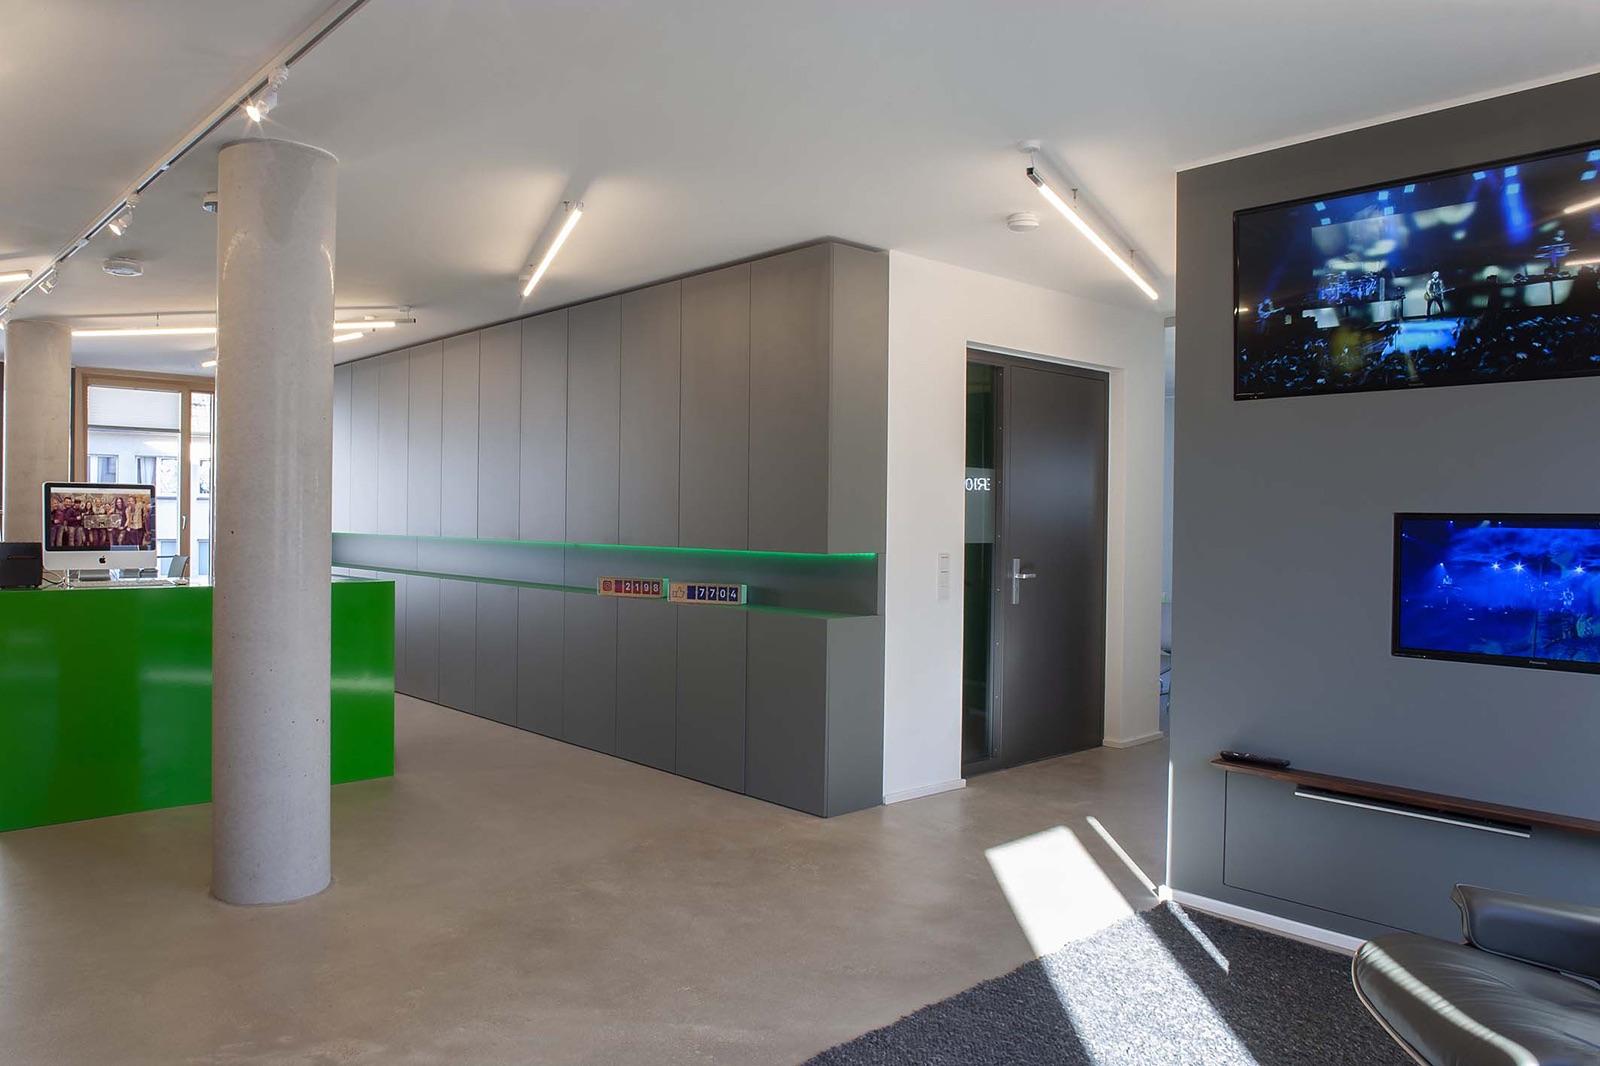 contra-bochum-office-7